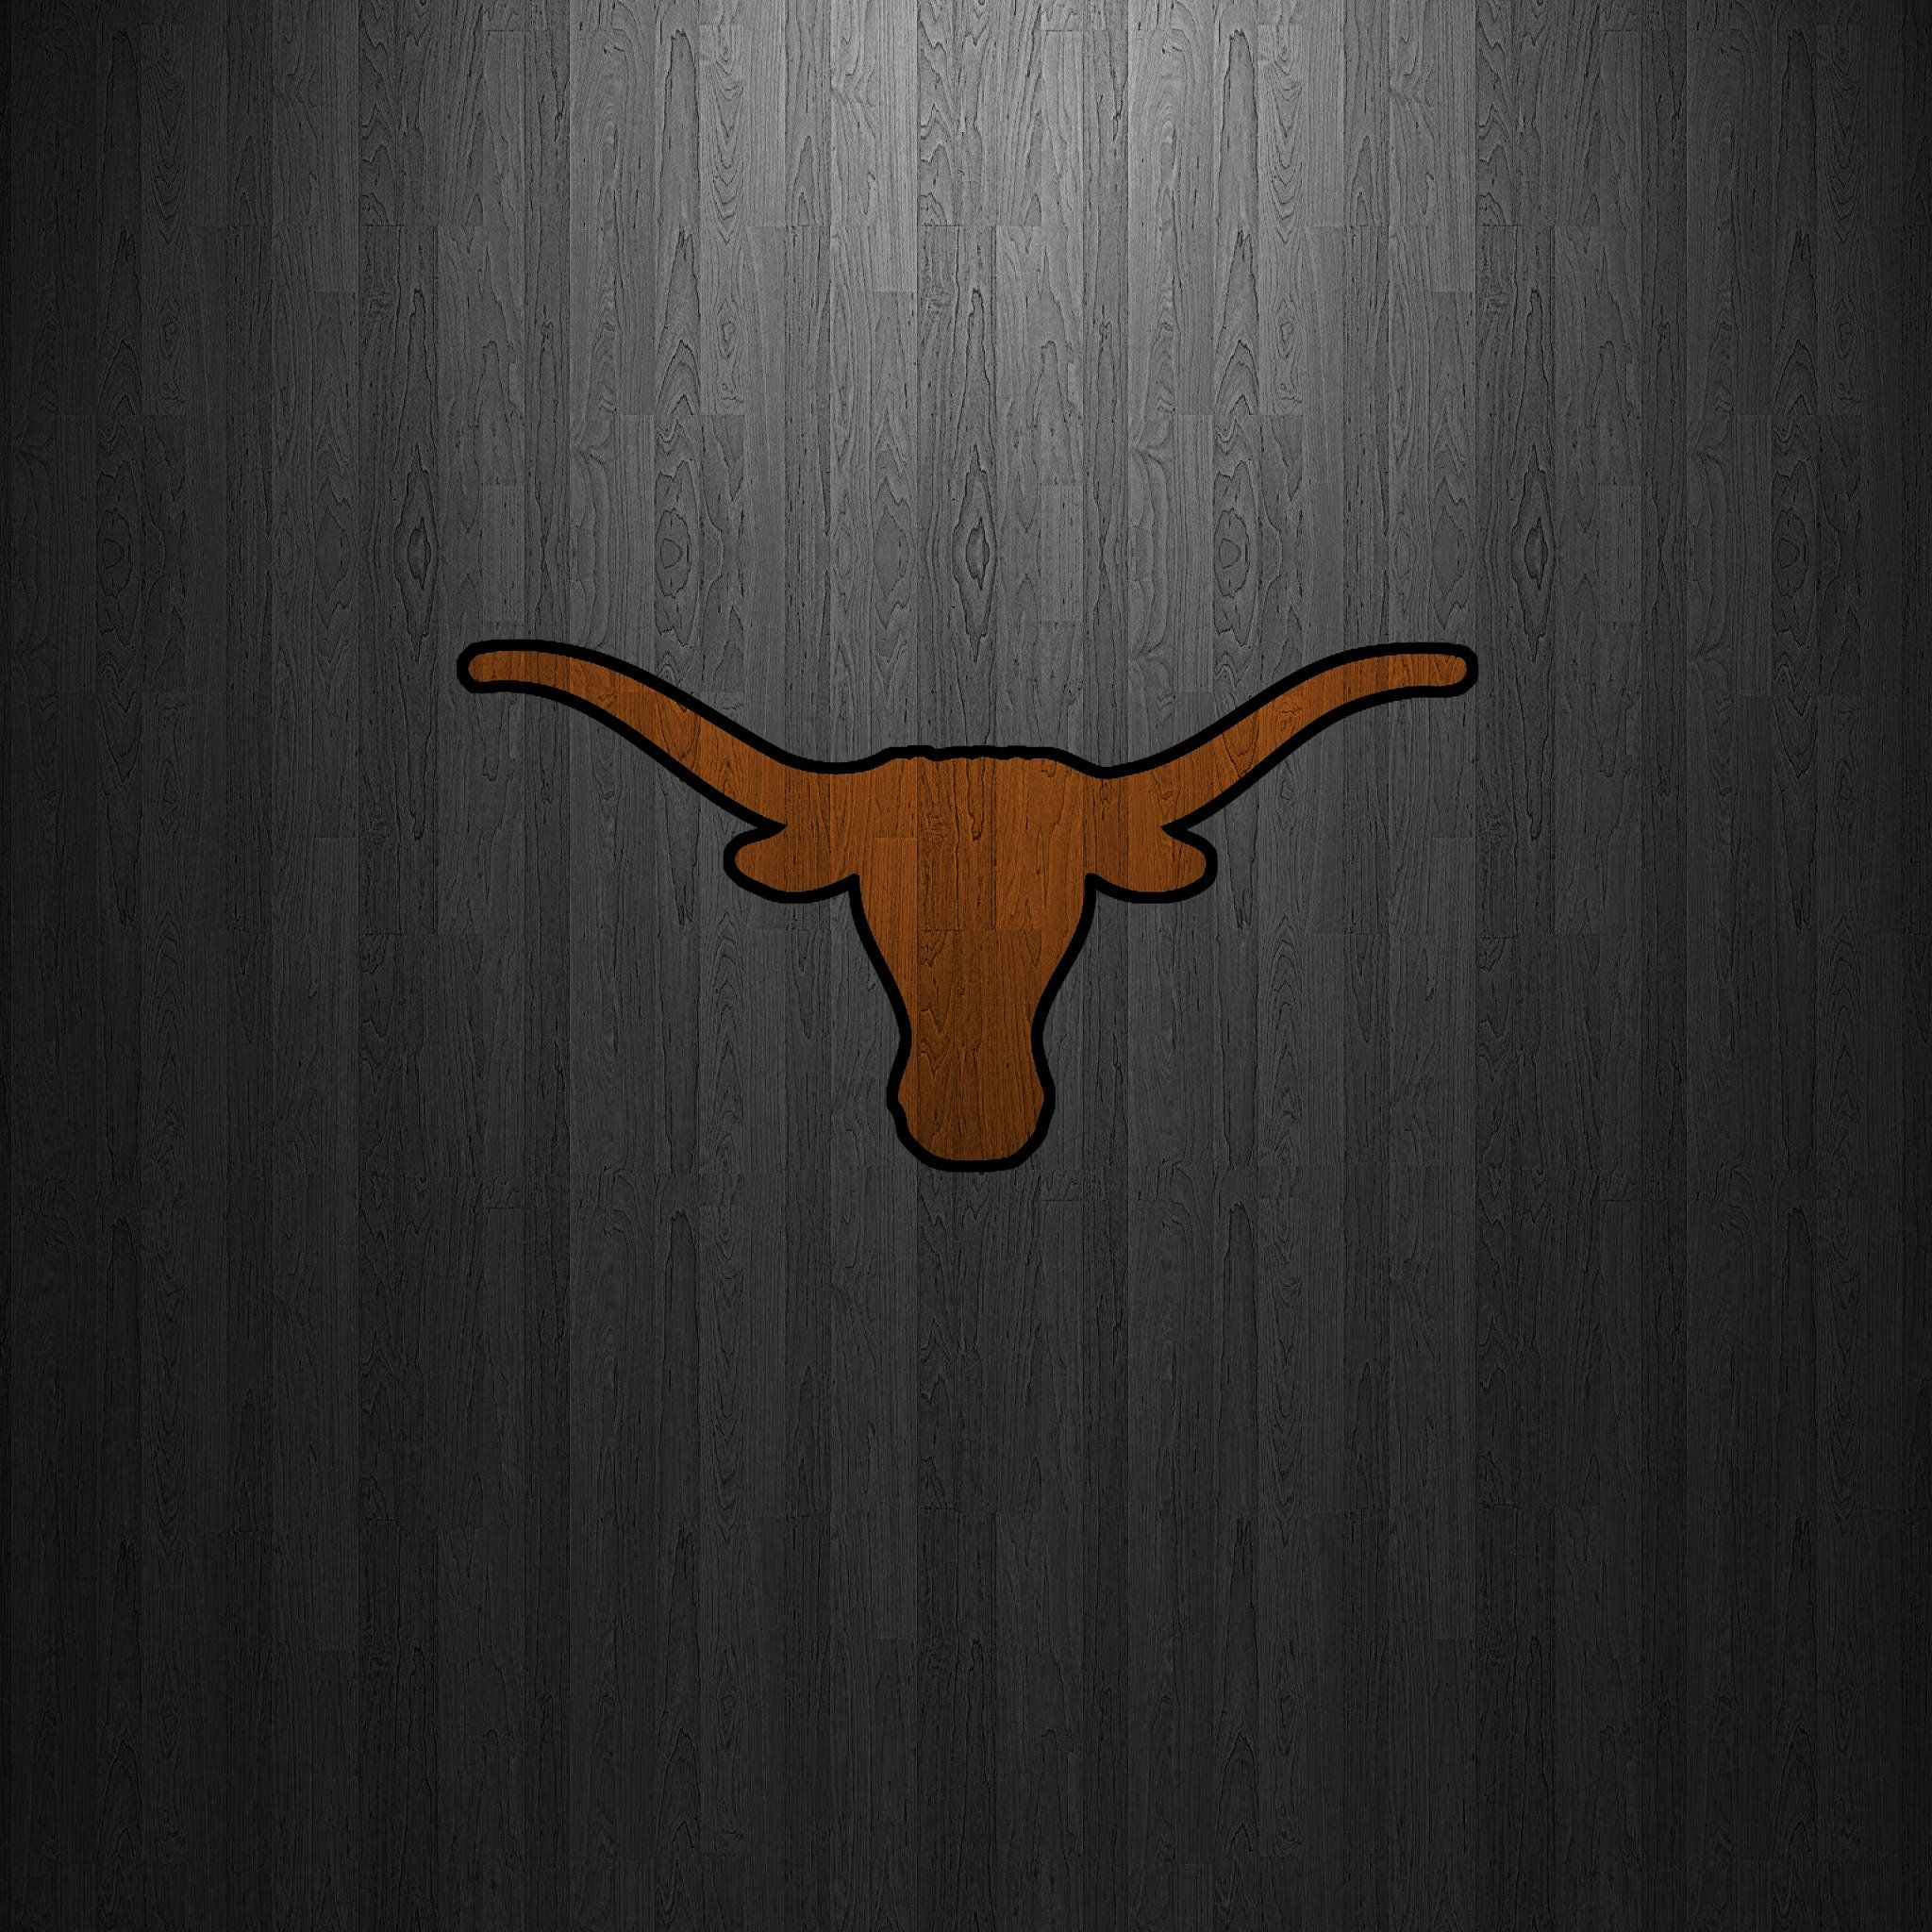 Hd Texas Longhorns Football Backgrounds Wallpapers Backgrounds Texas Longhorns Logo Longhorns Football Texas Longhorns Football